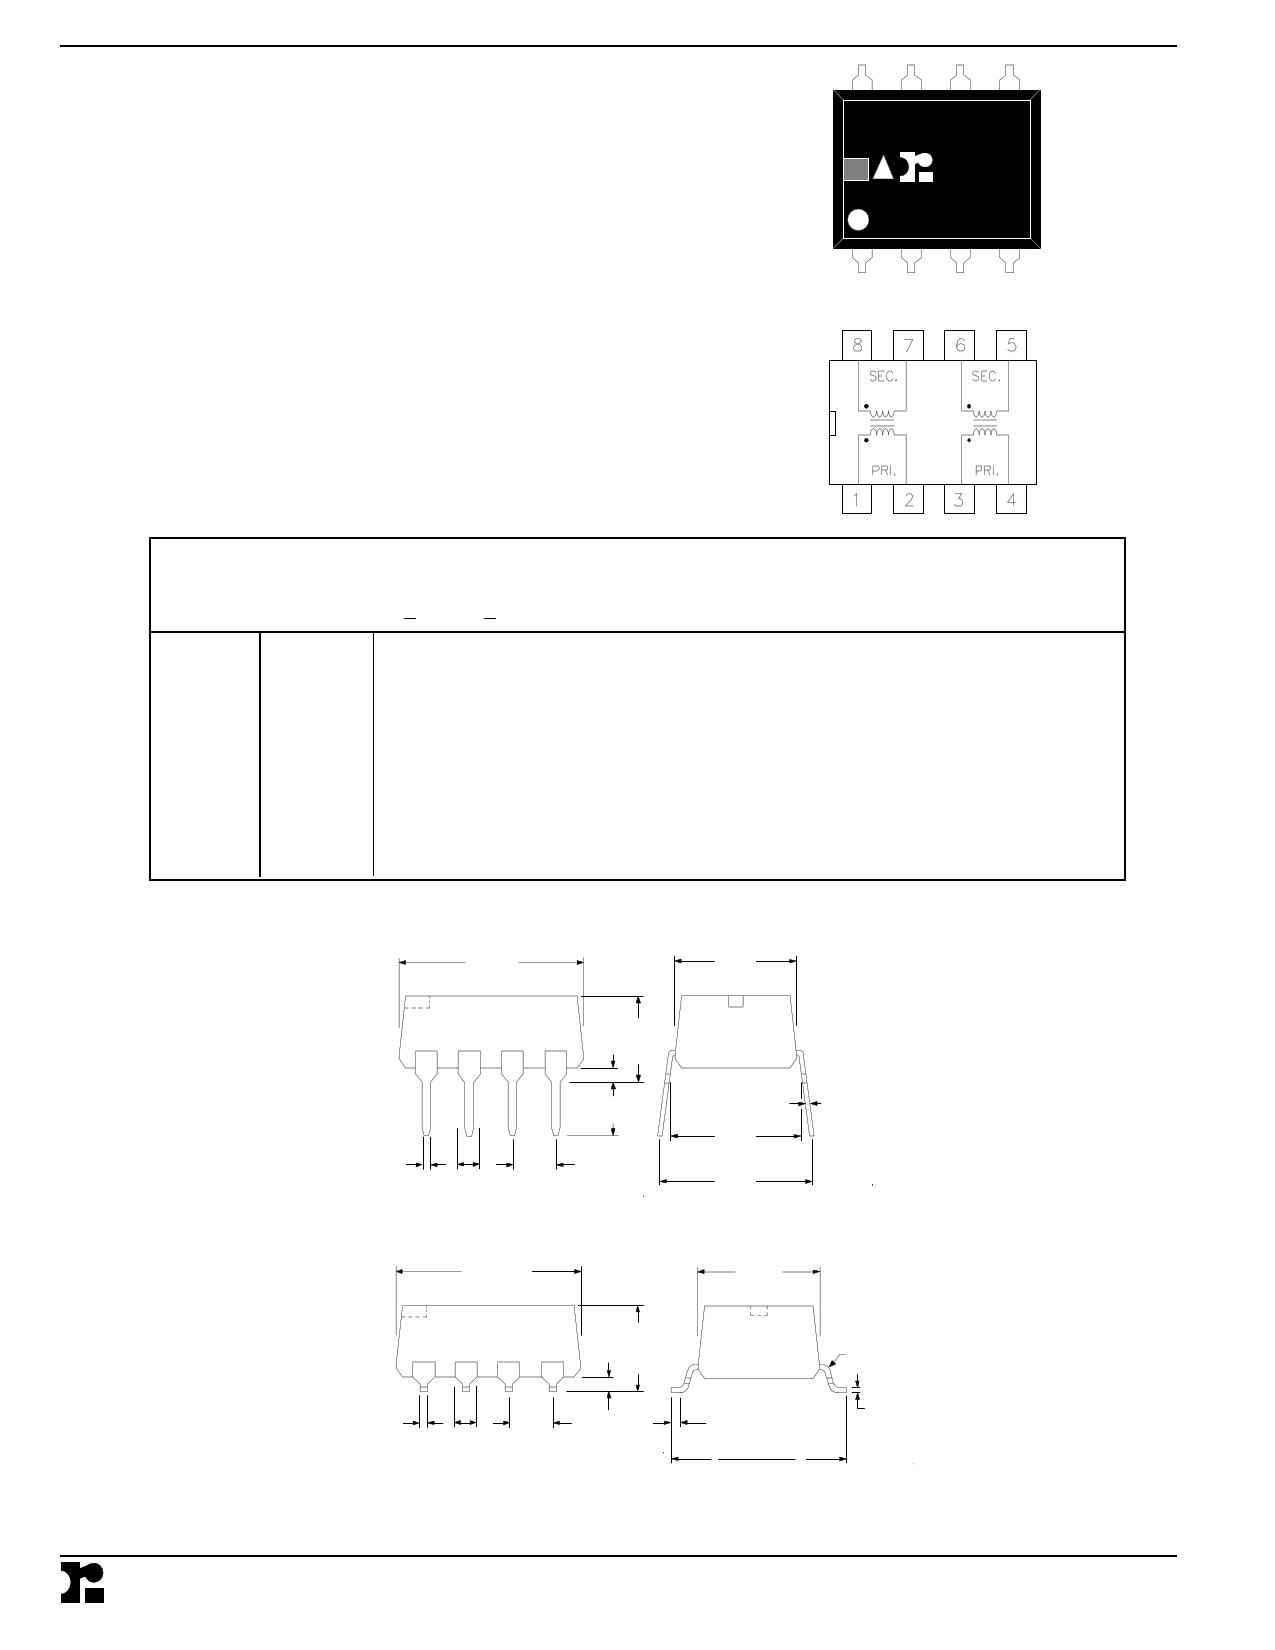 T-11303 datasheet